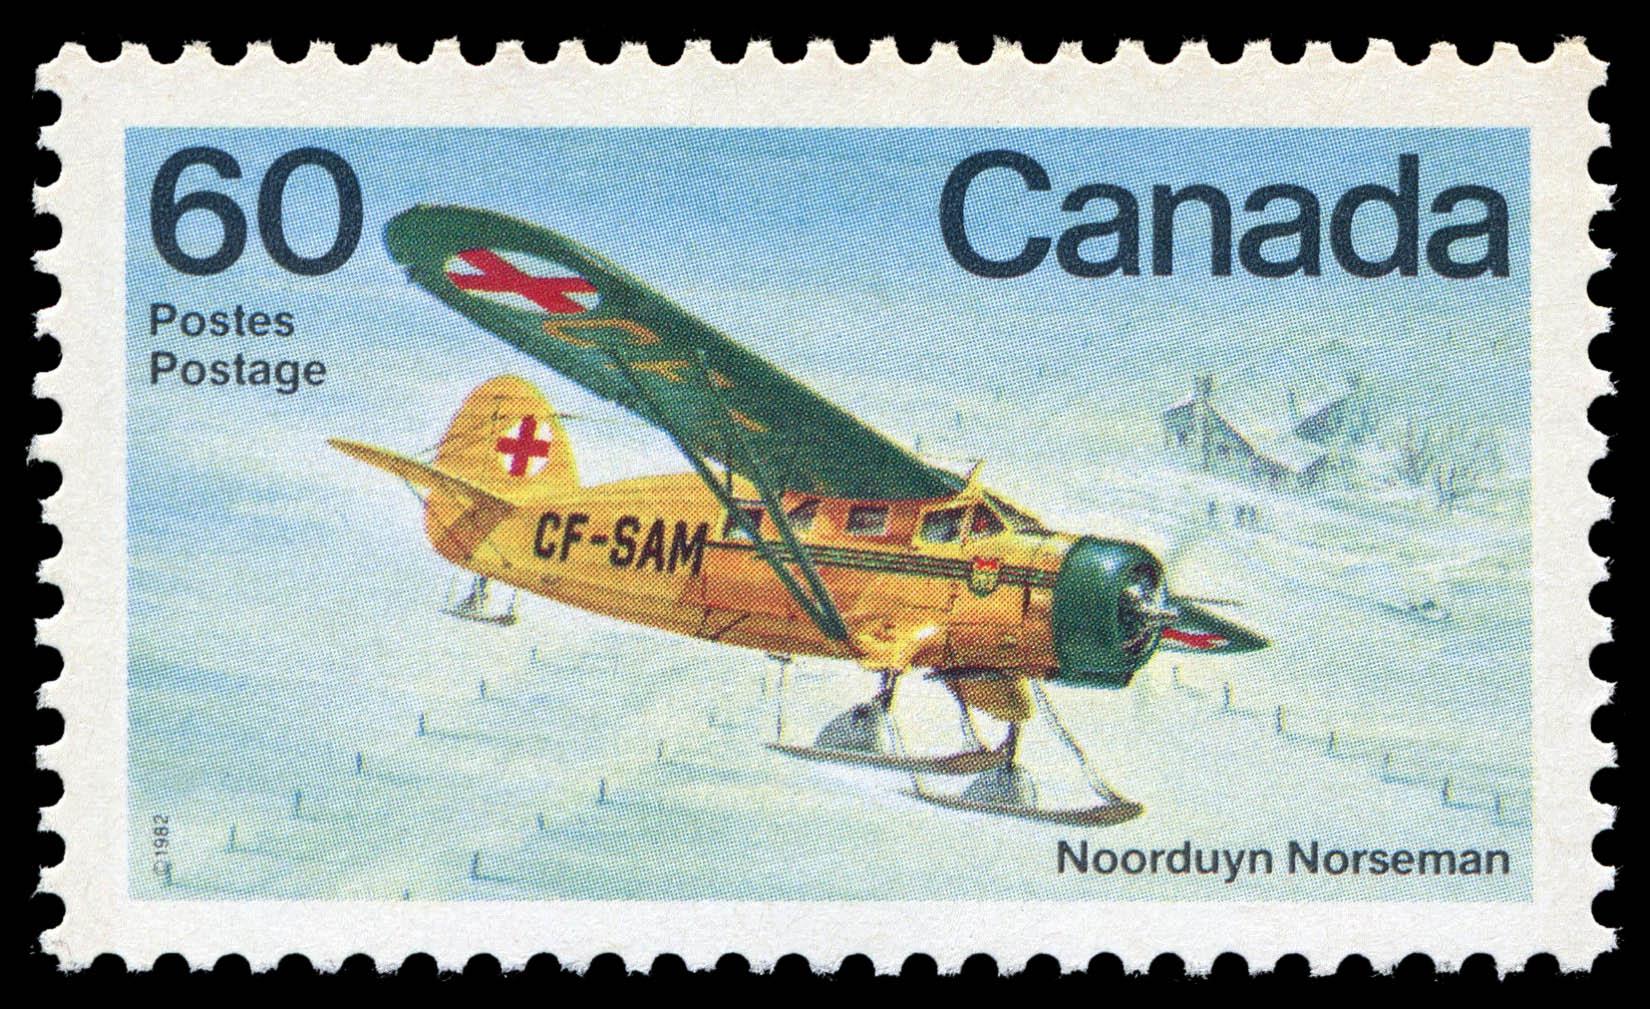 Noorduyn Norseman Canada Postage Stamp